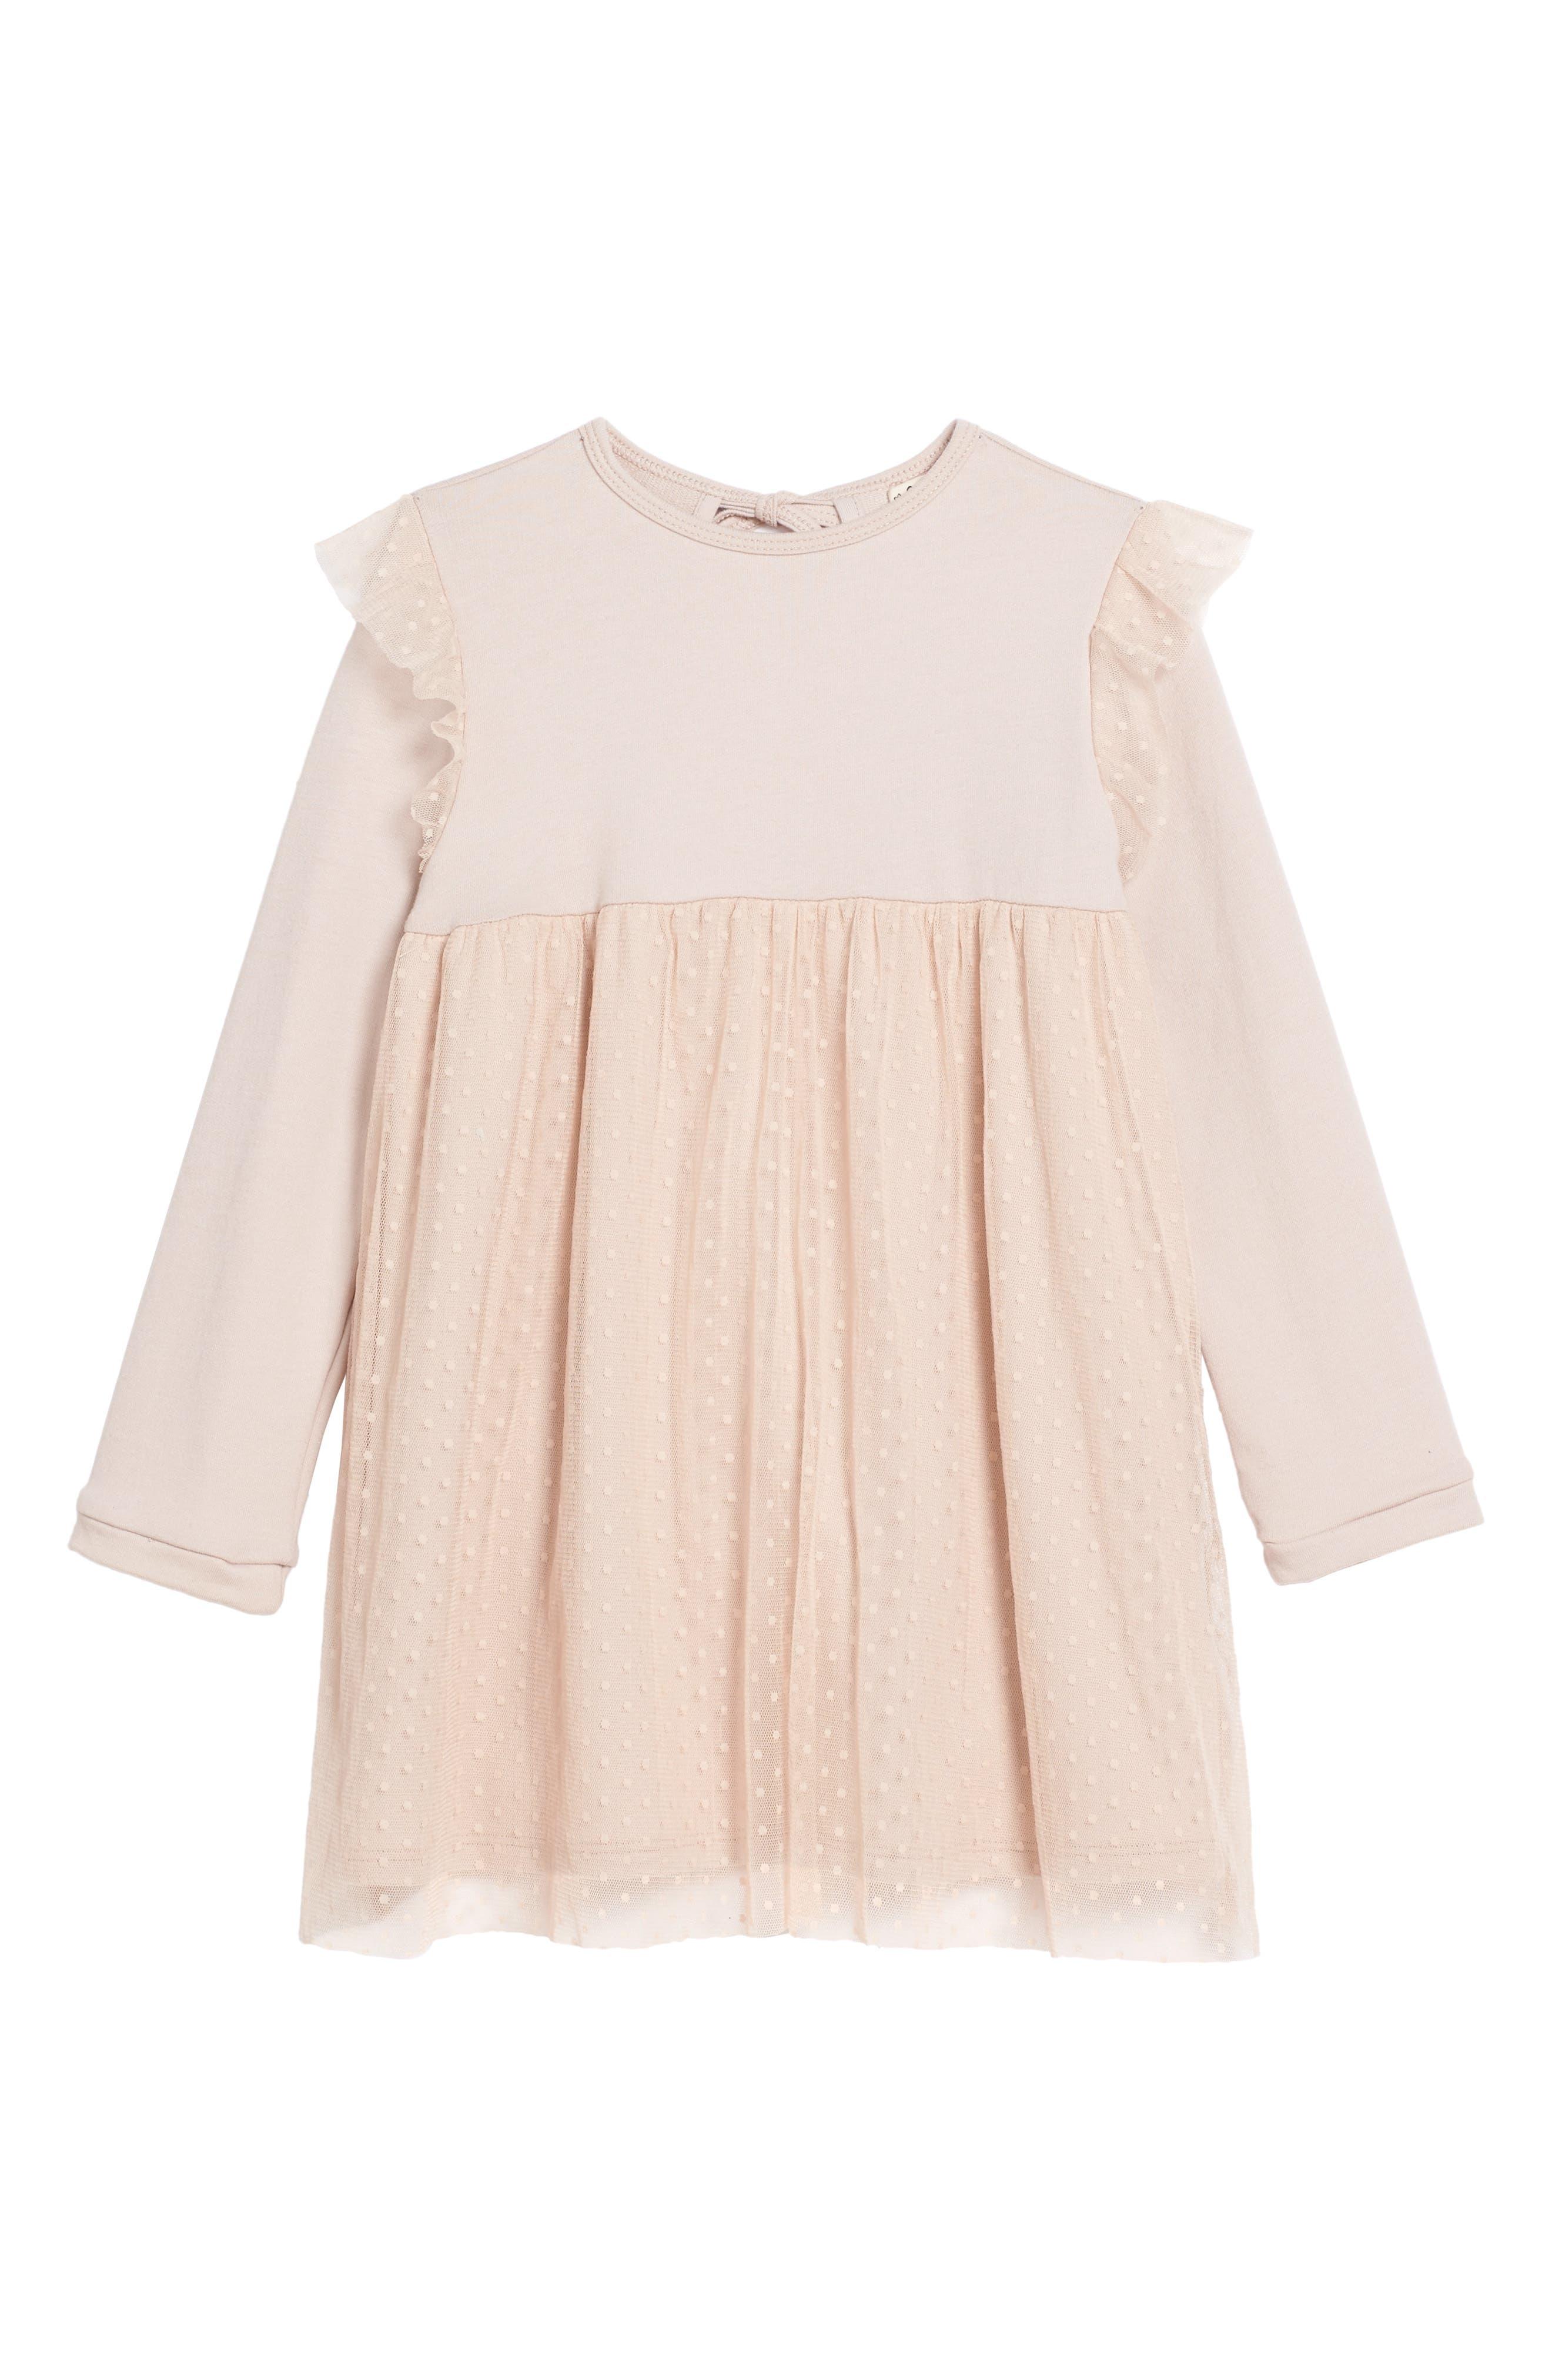 Ballerina Tulle Dress,                         Main,                         color, 650